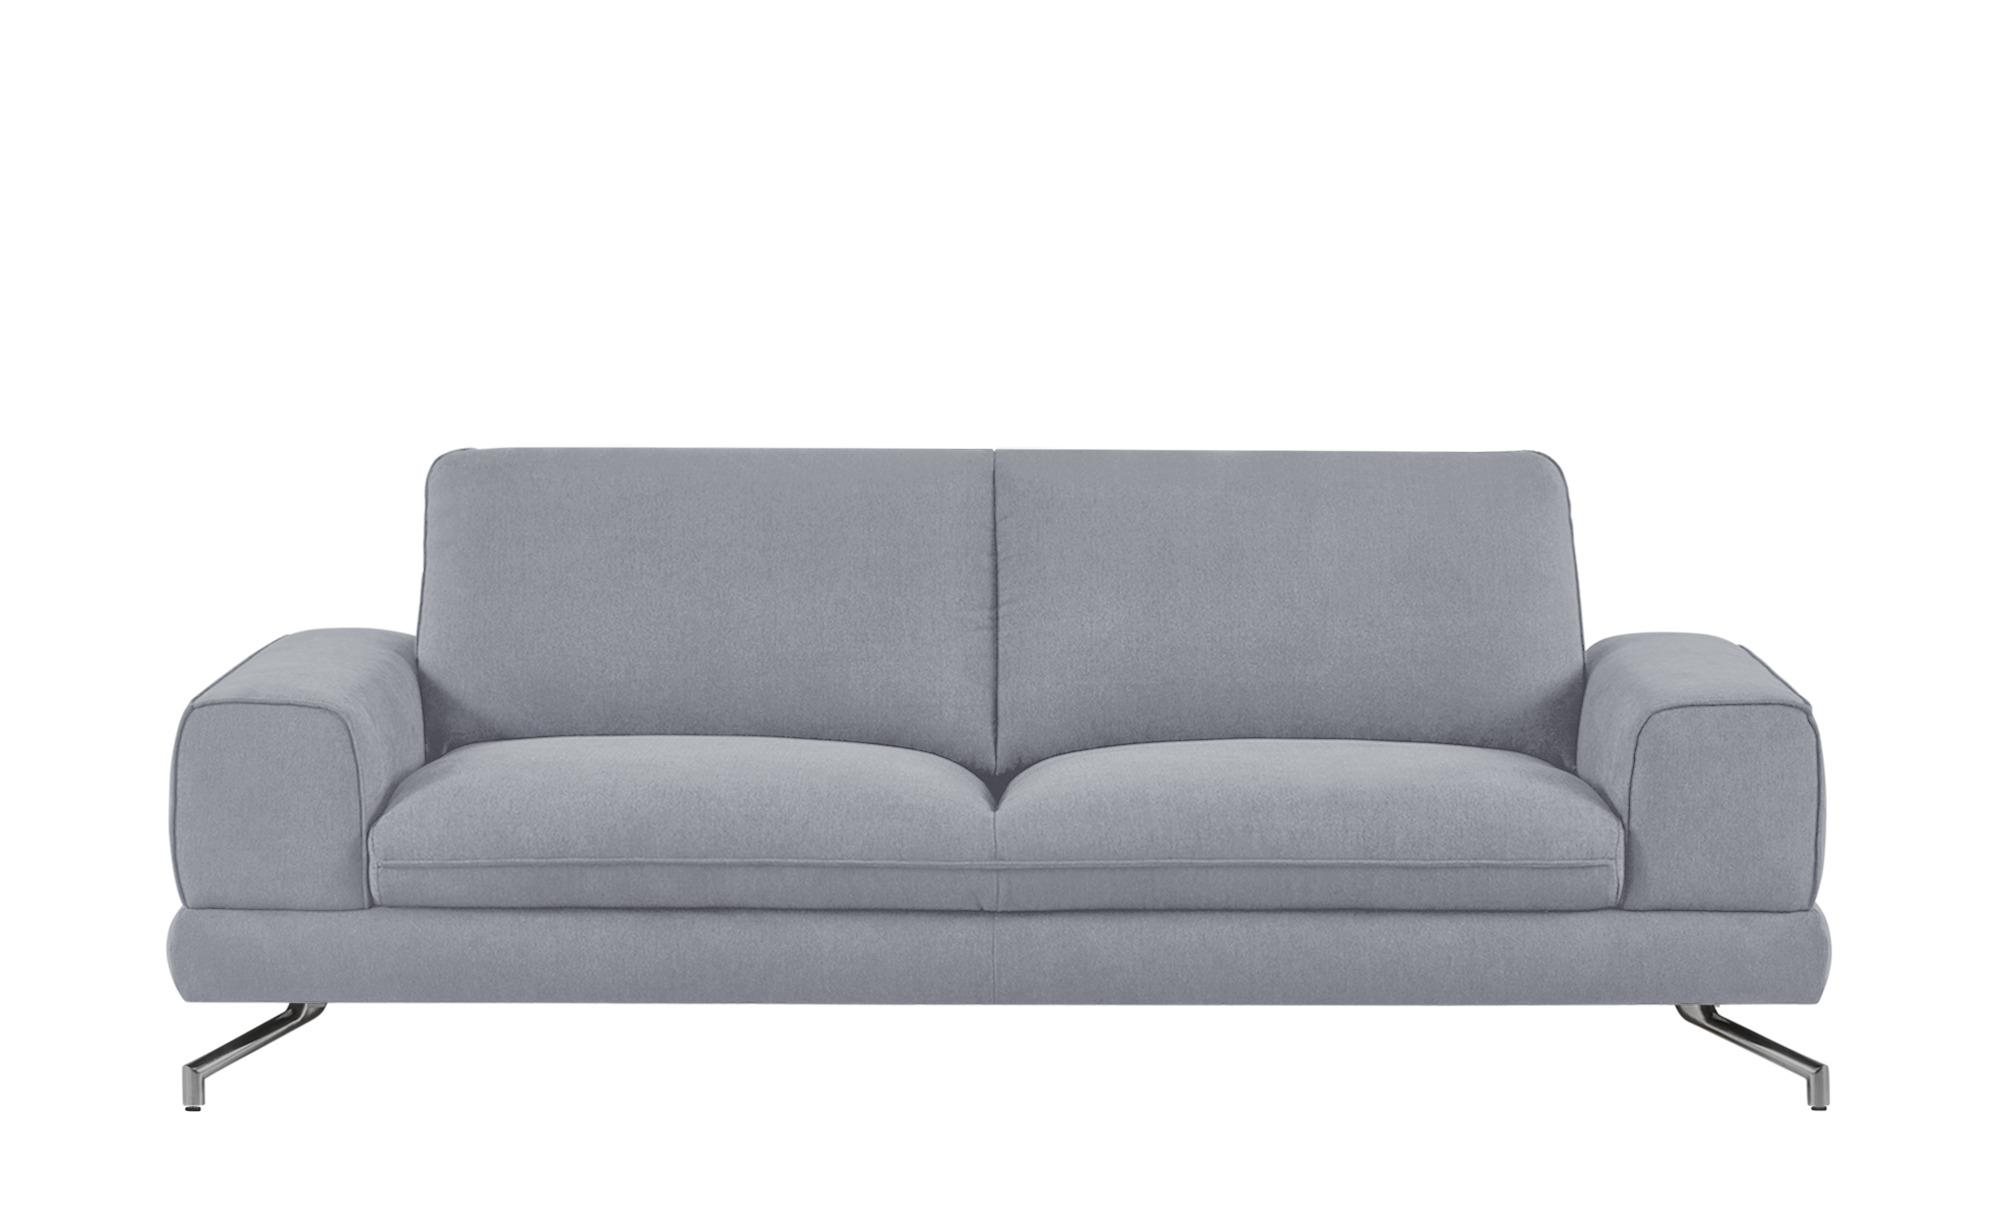 smart Sofa grau - Stoff Bonika ¦ silber ¦ Maße (cm): B: 218 H: 83 T: 95 Polstermöbel > Sofas > 3-Sitzer - Höffner